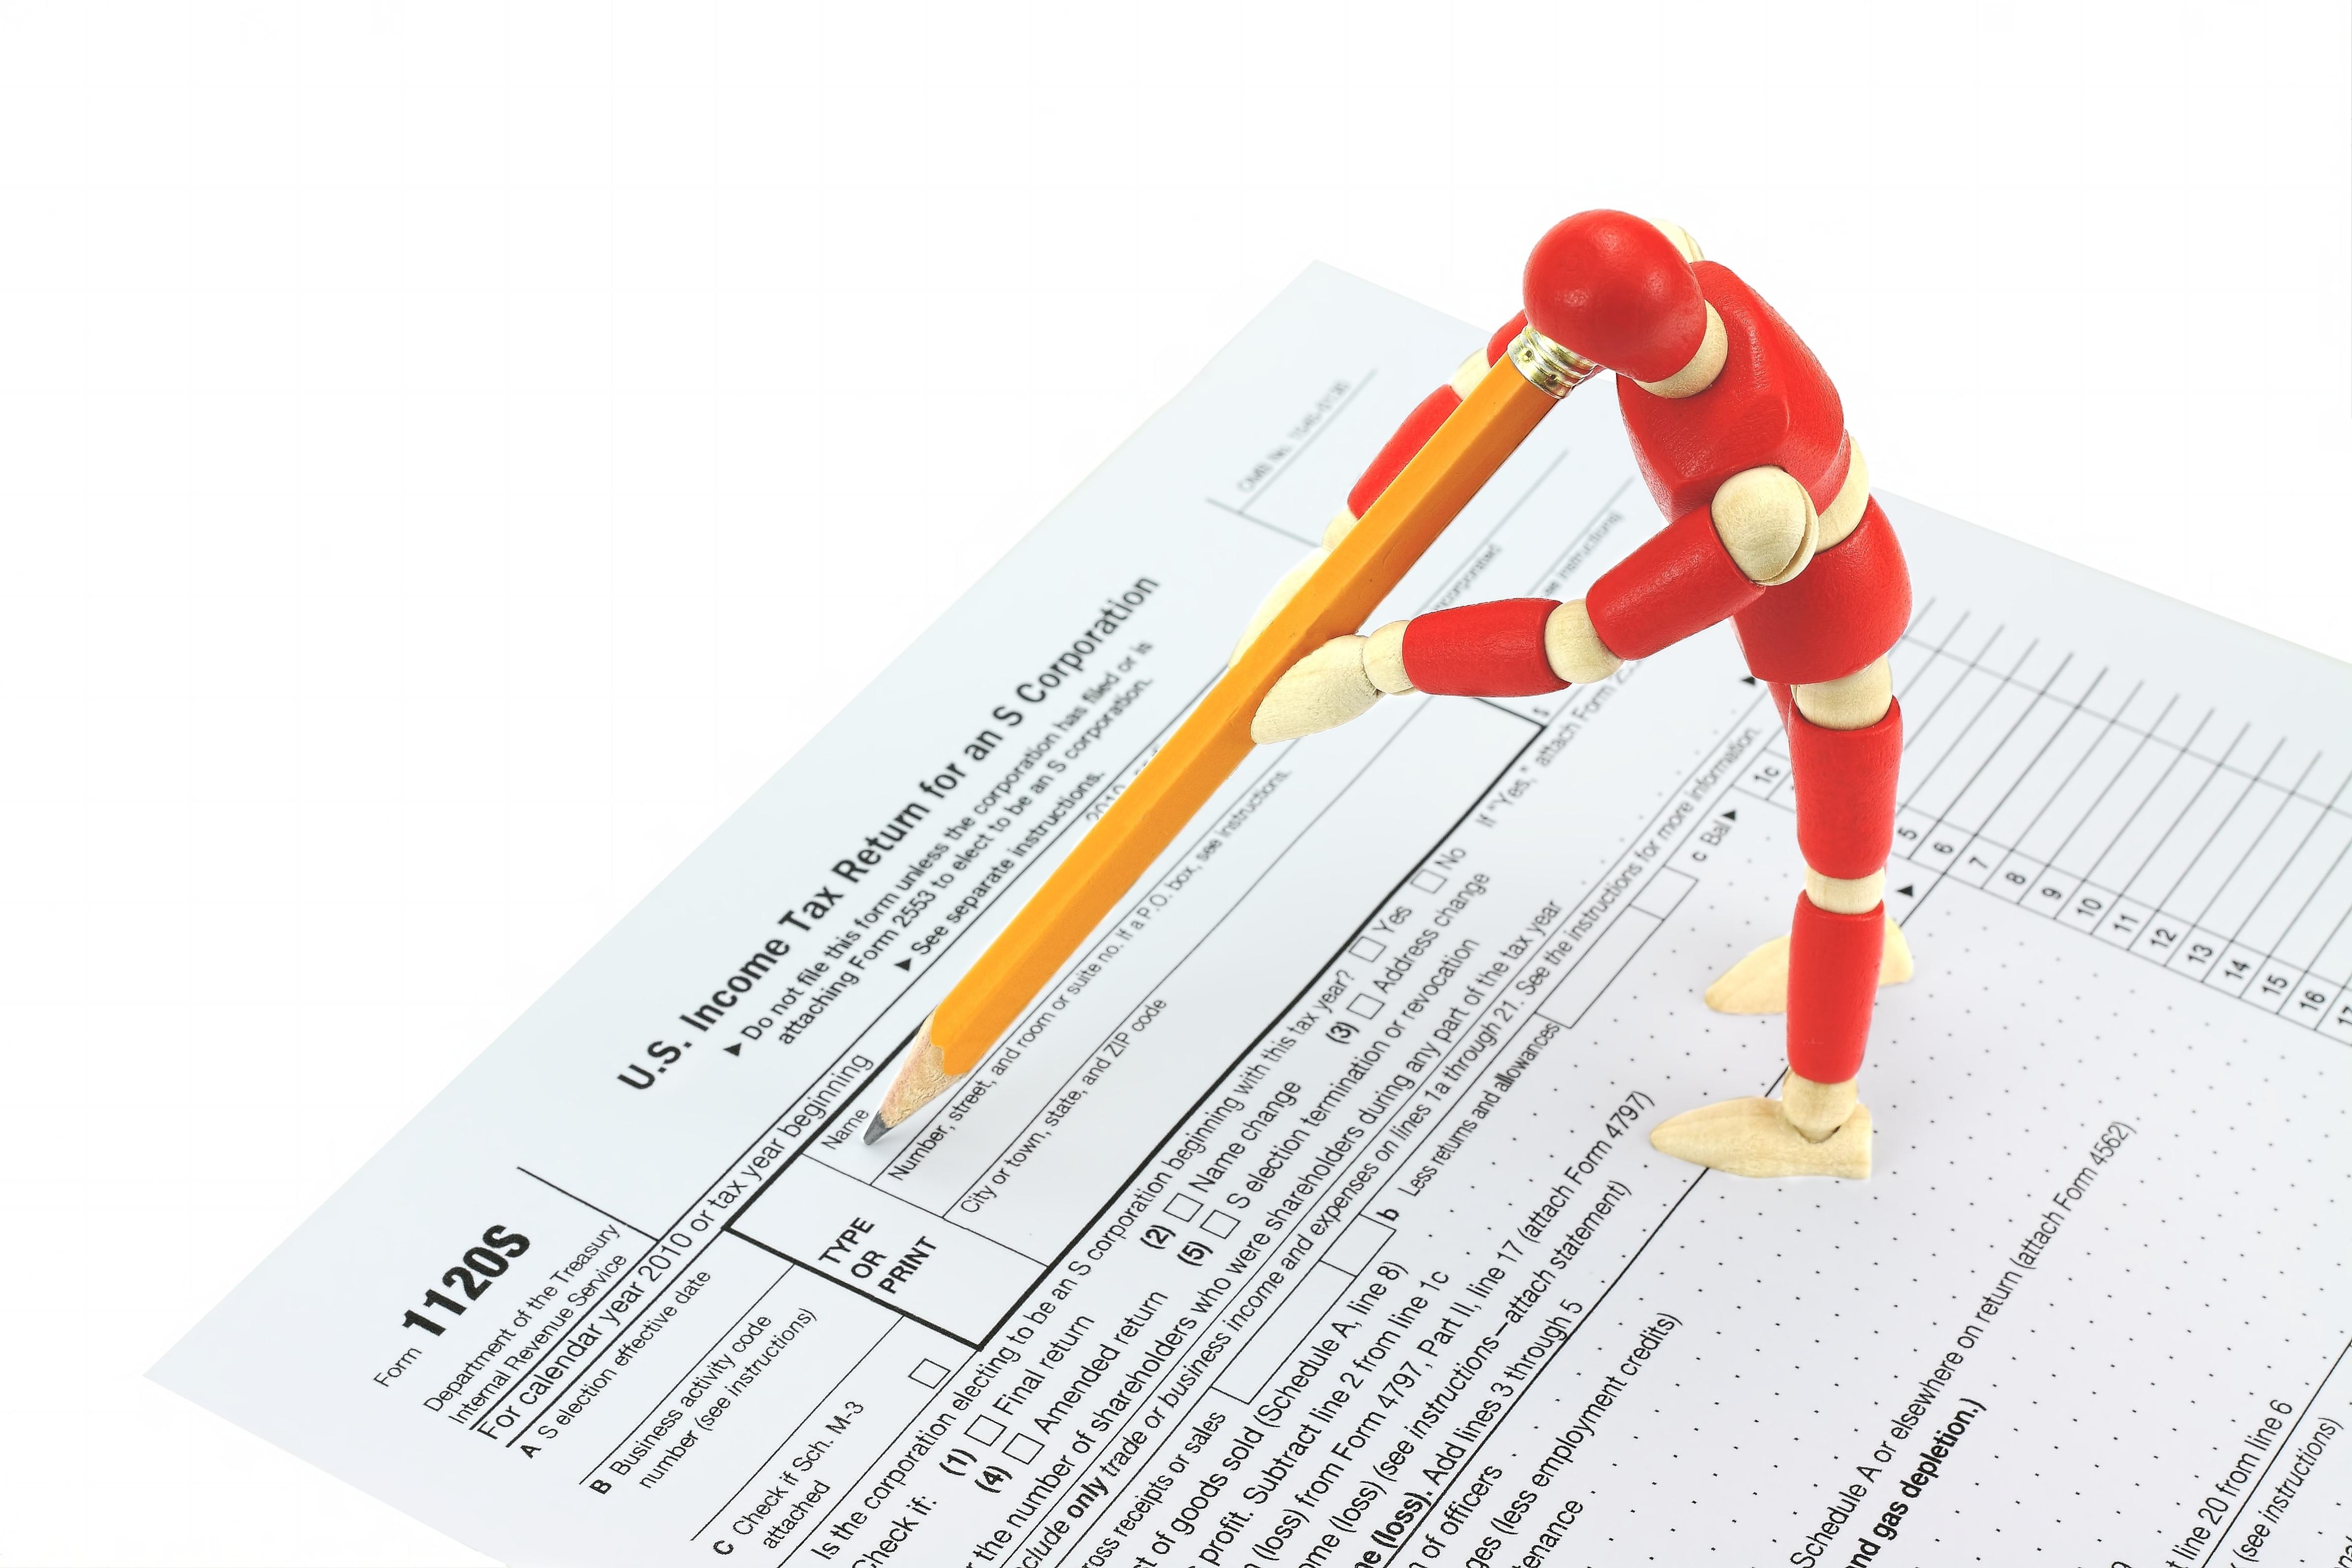 S-Corp Tax Return Prep. - Form 1120S